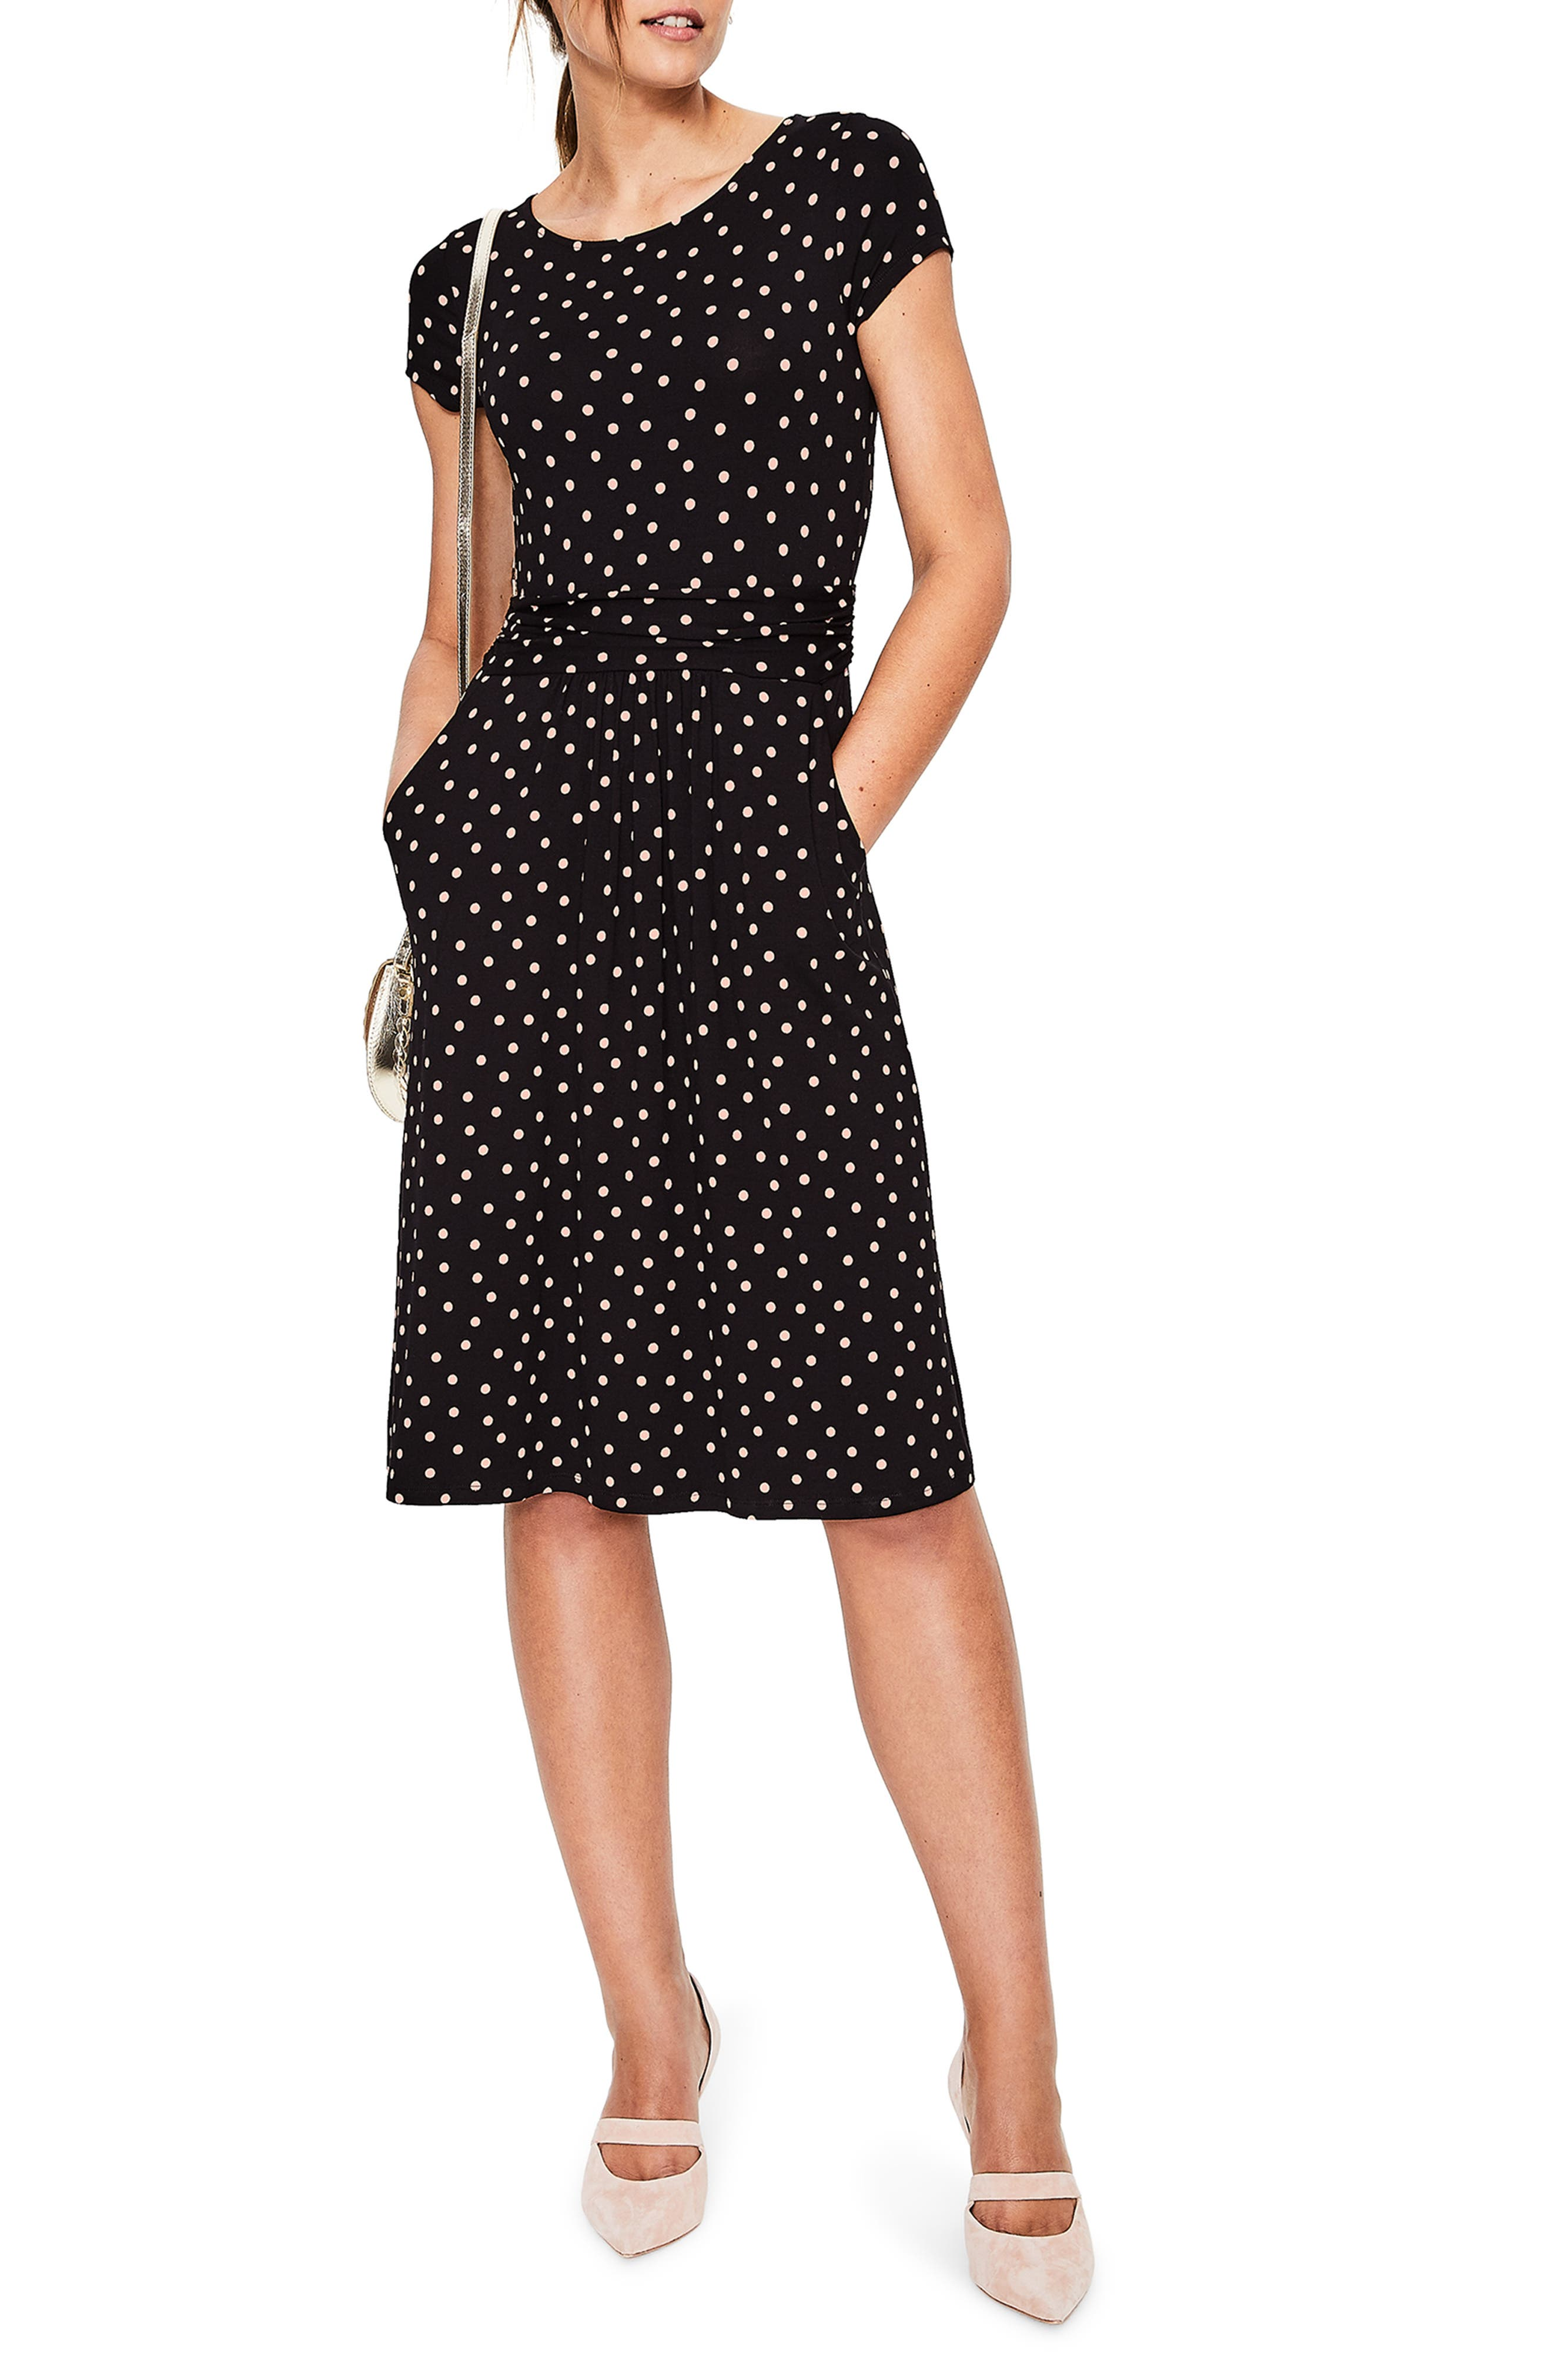 Boden Amelie Print Jersey Dress feb57cc38